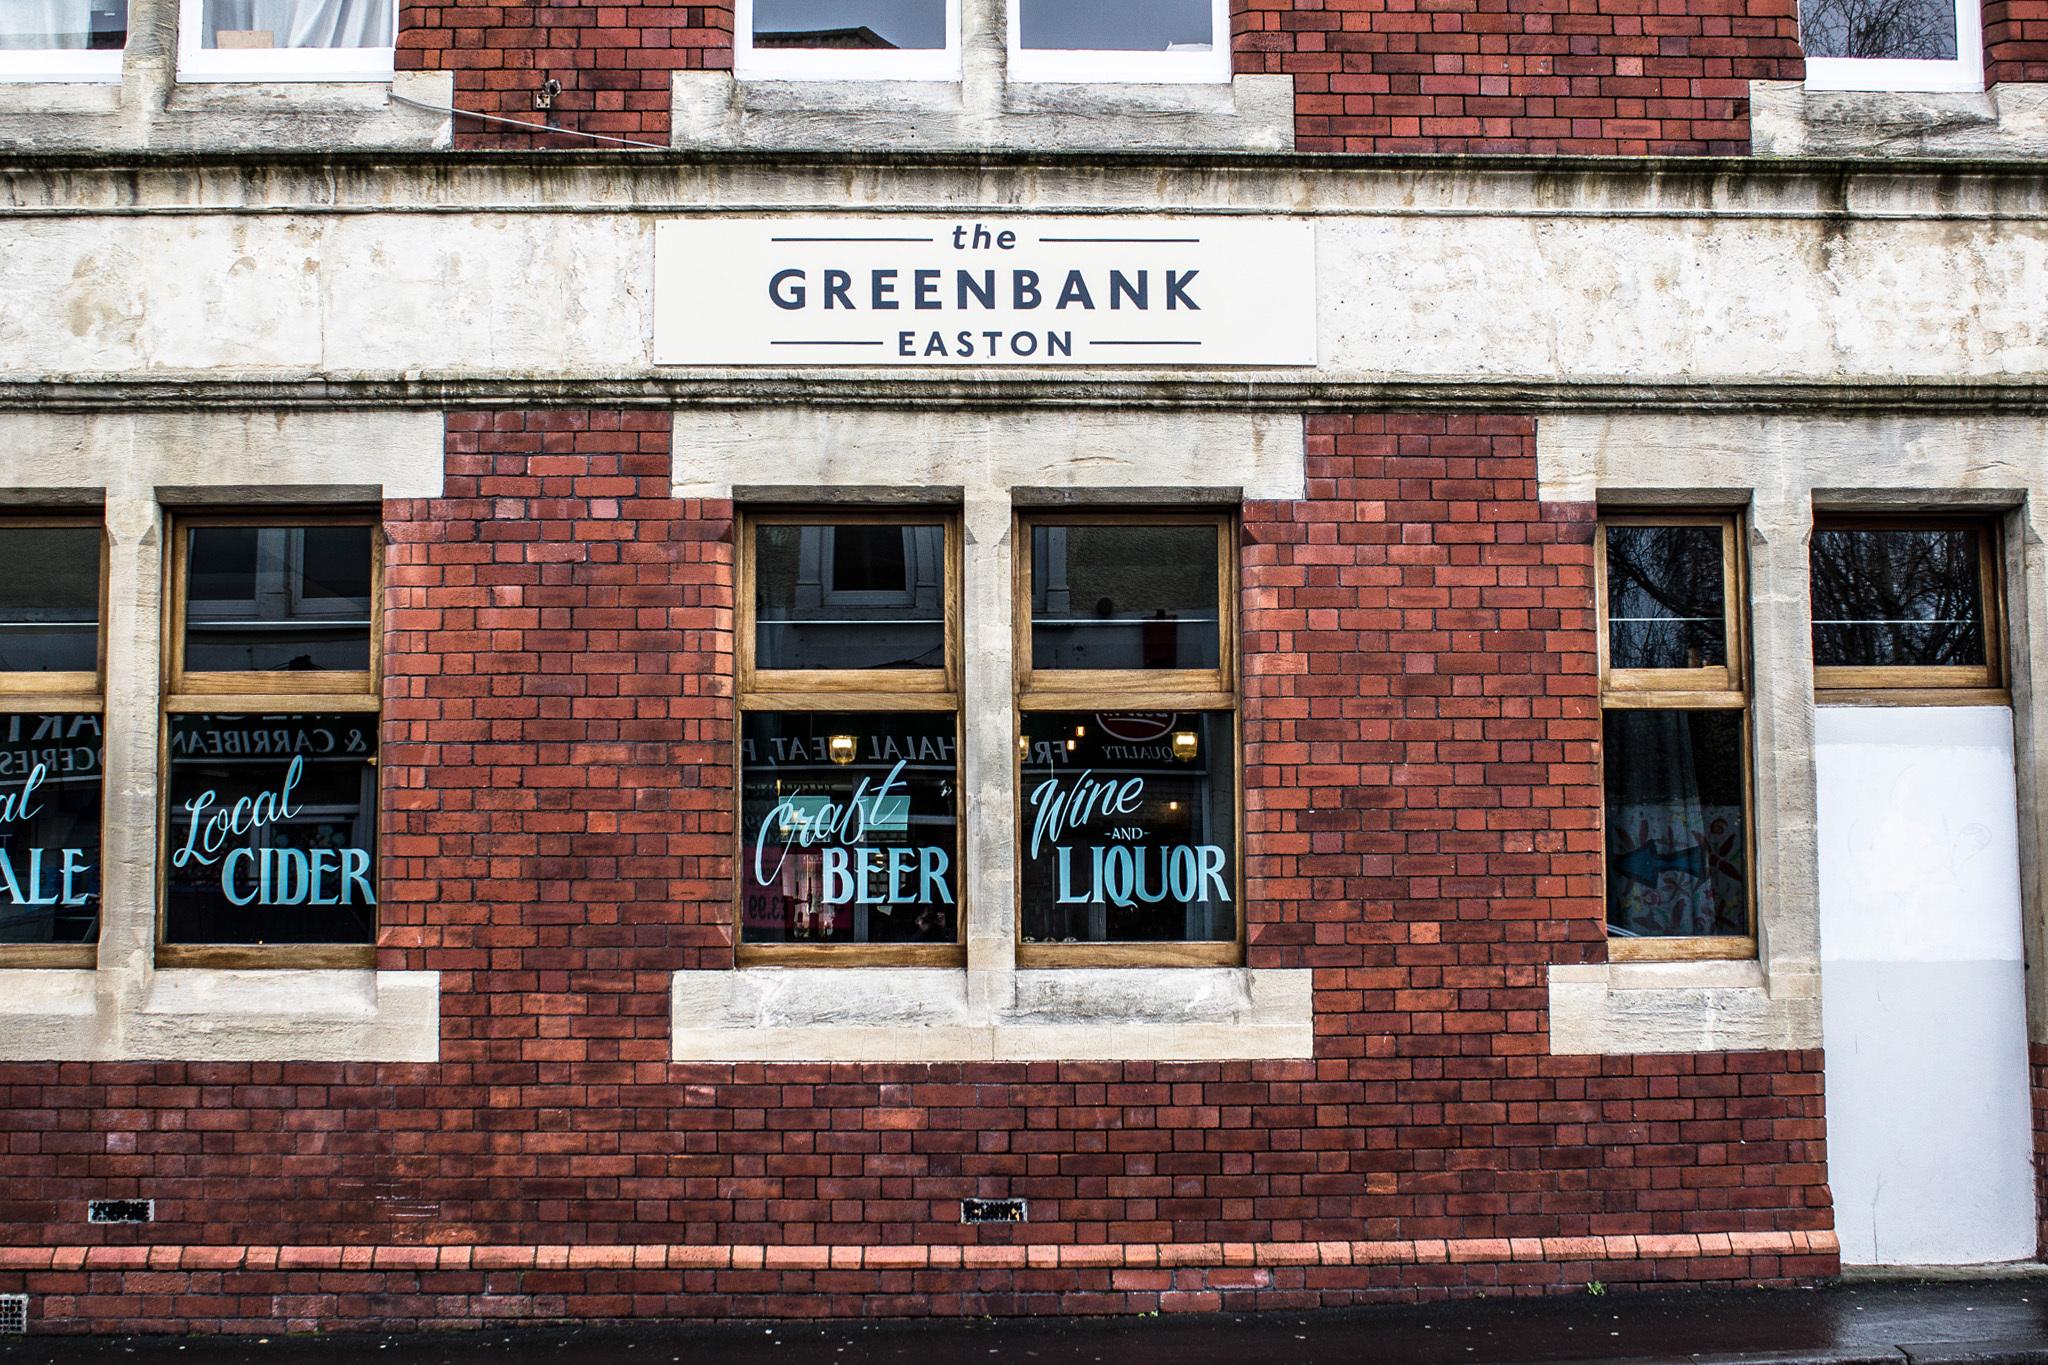 The Greenbank